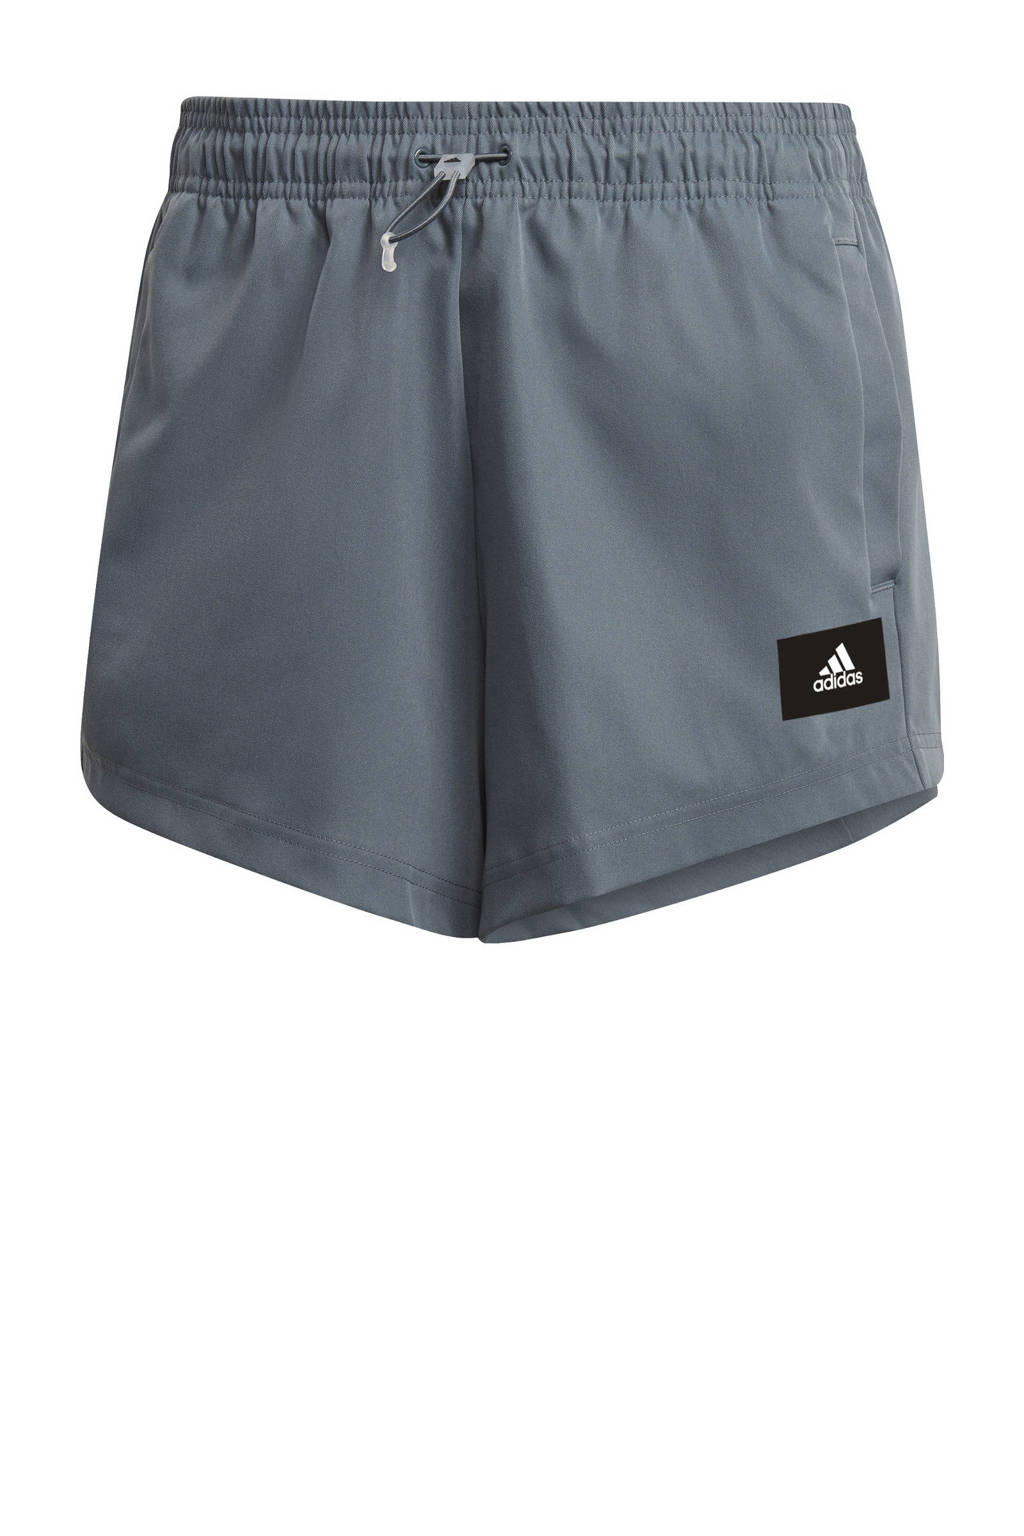 adidas Performance sportshort grijsblauw, Grijsblauw